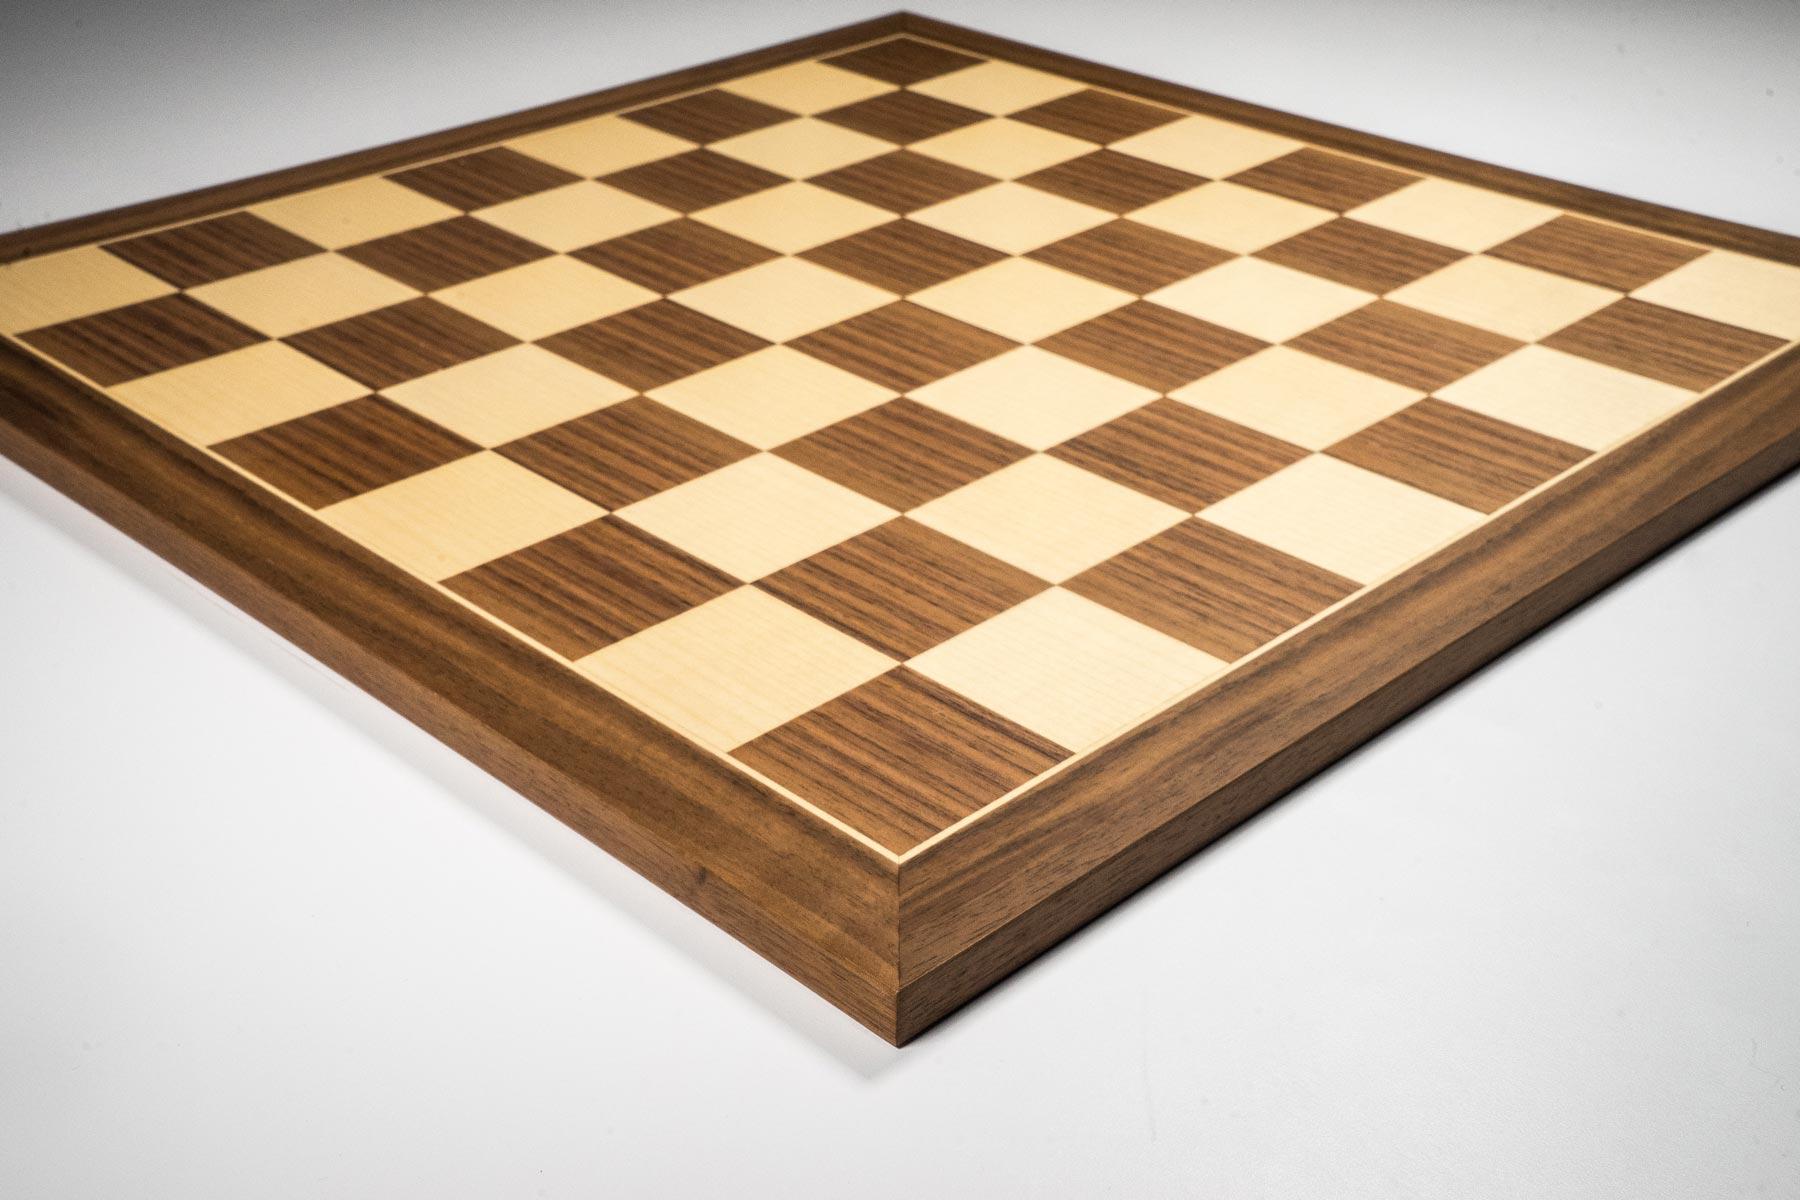 Walnut Chess Board